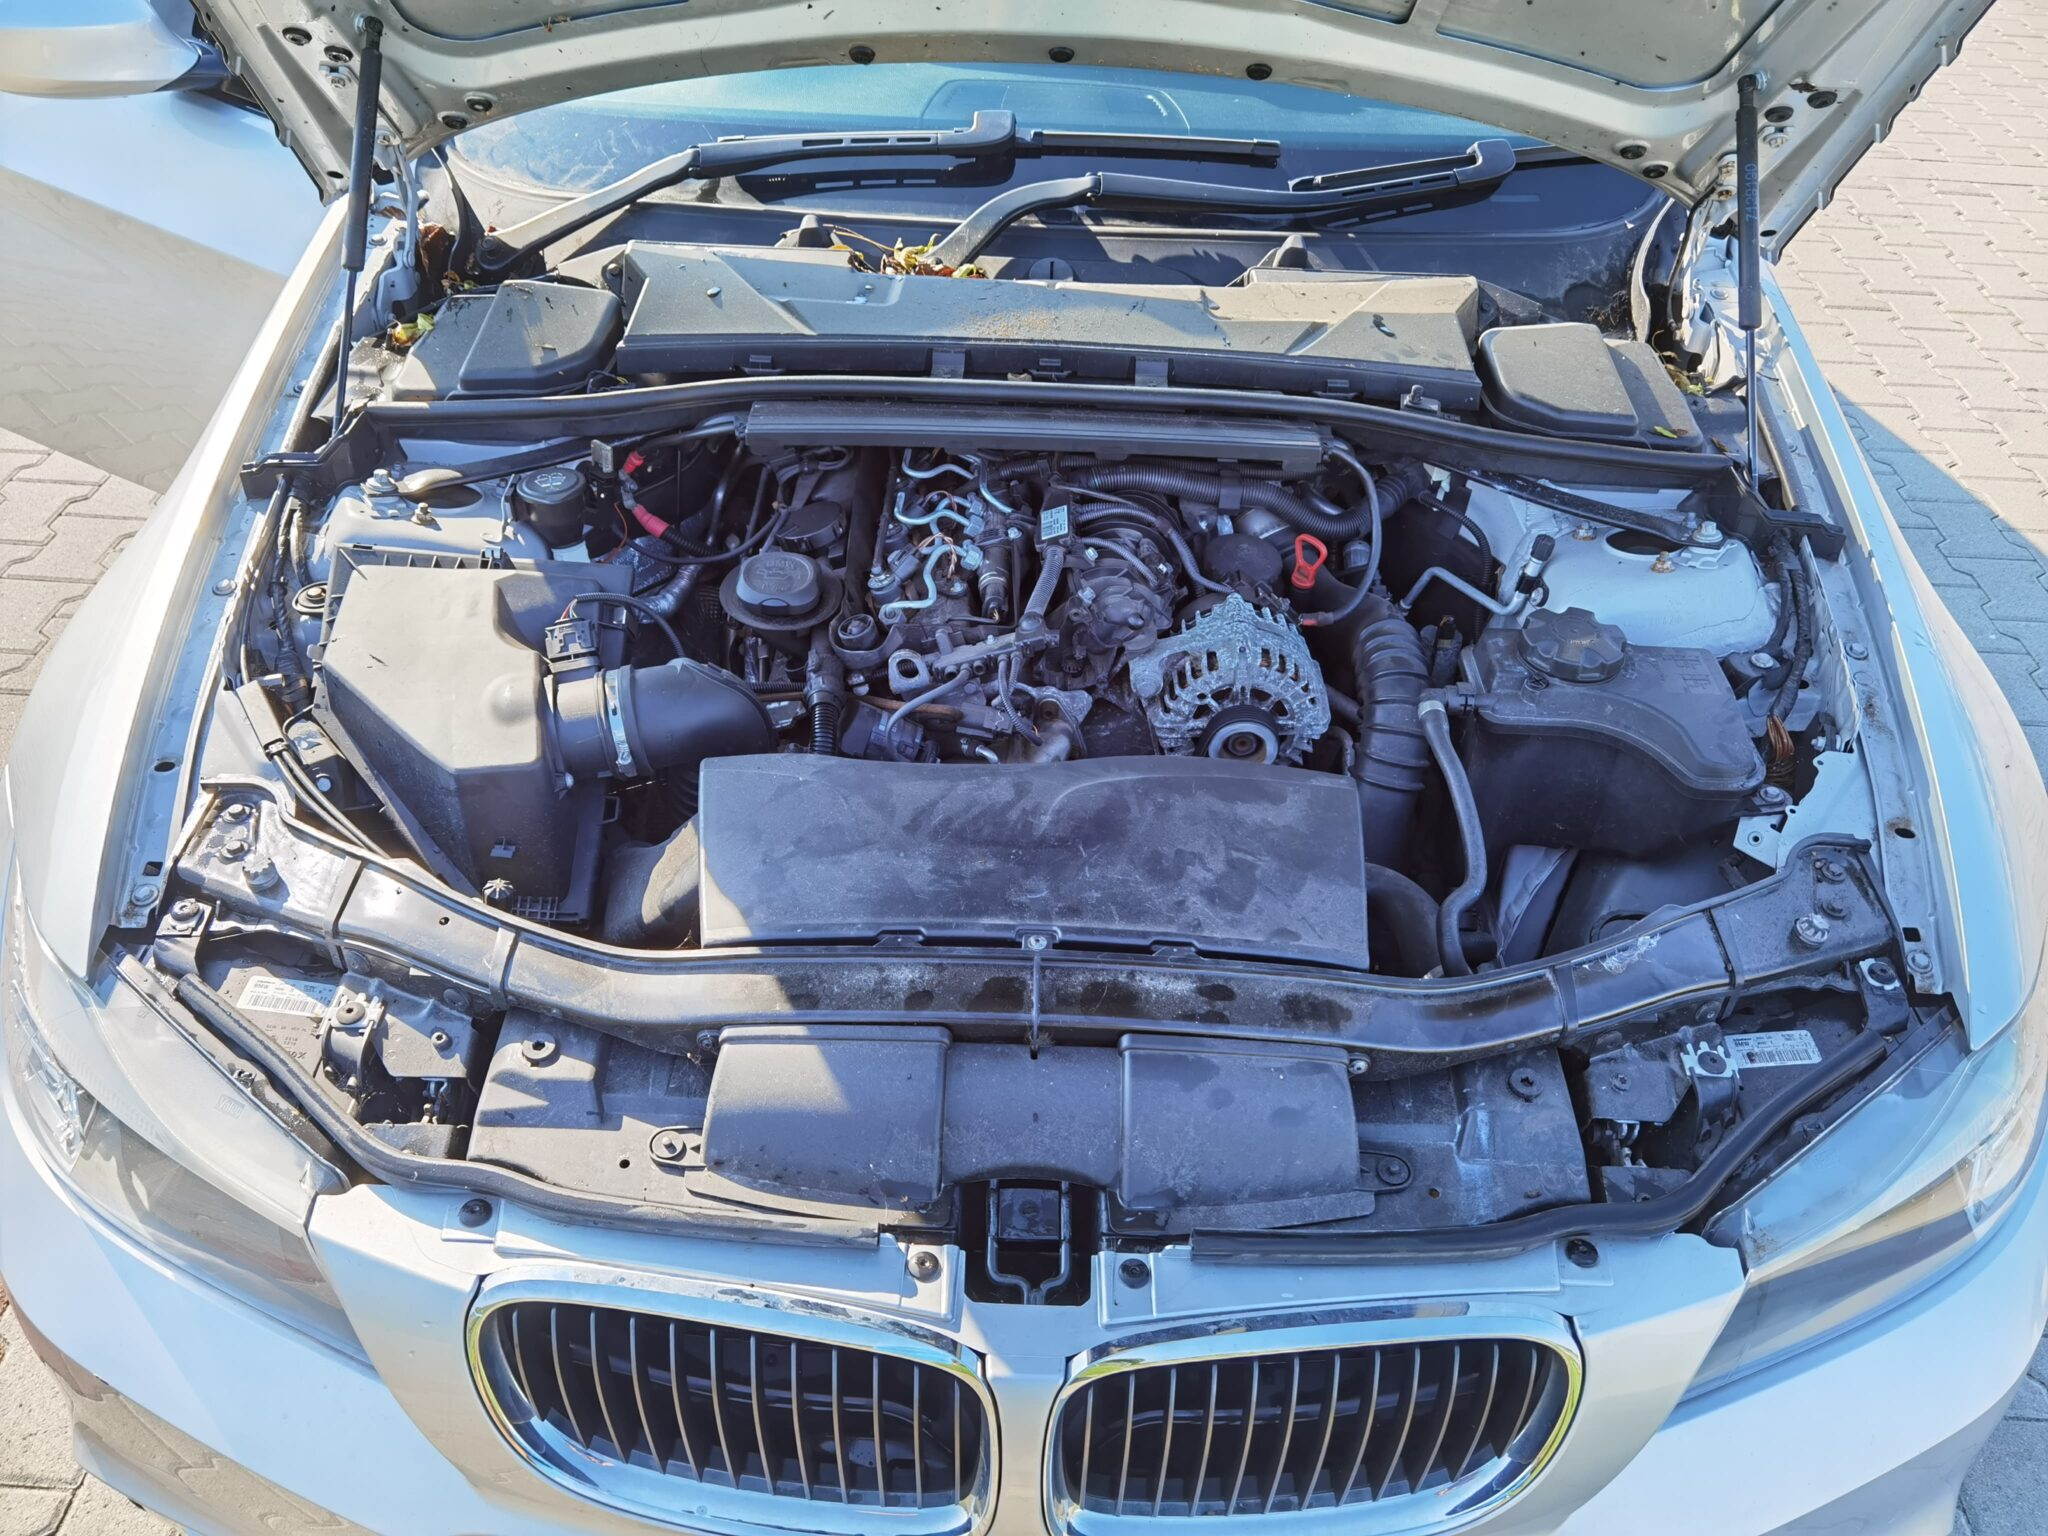 BMW E90 lci 318d Carbon Car Center Békéscsaba-15